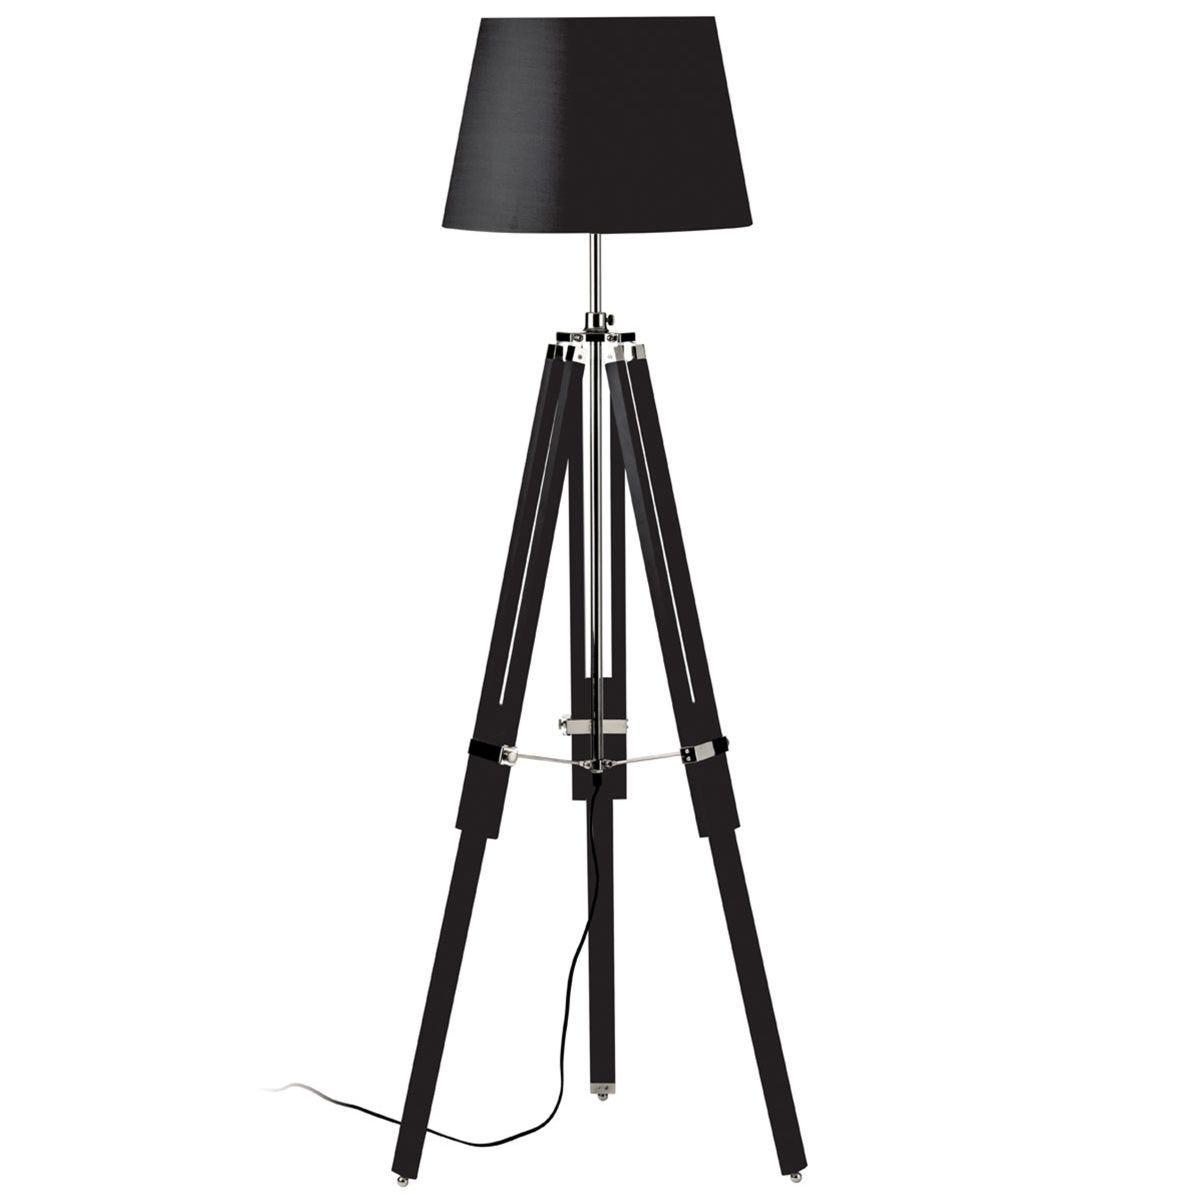 Premier Housewares Jasper Floor Lamp with Tripod Base - Black